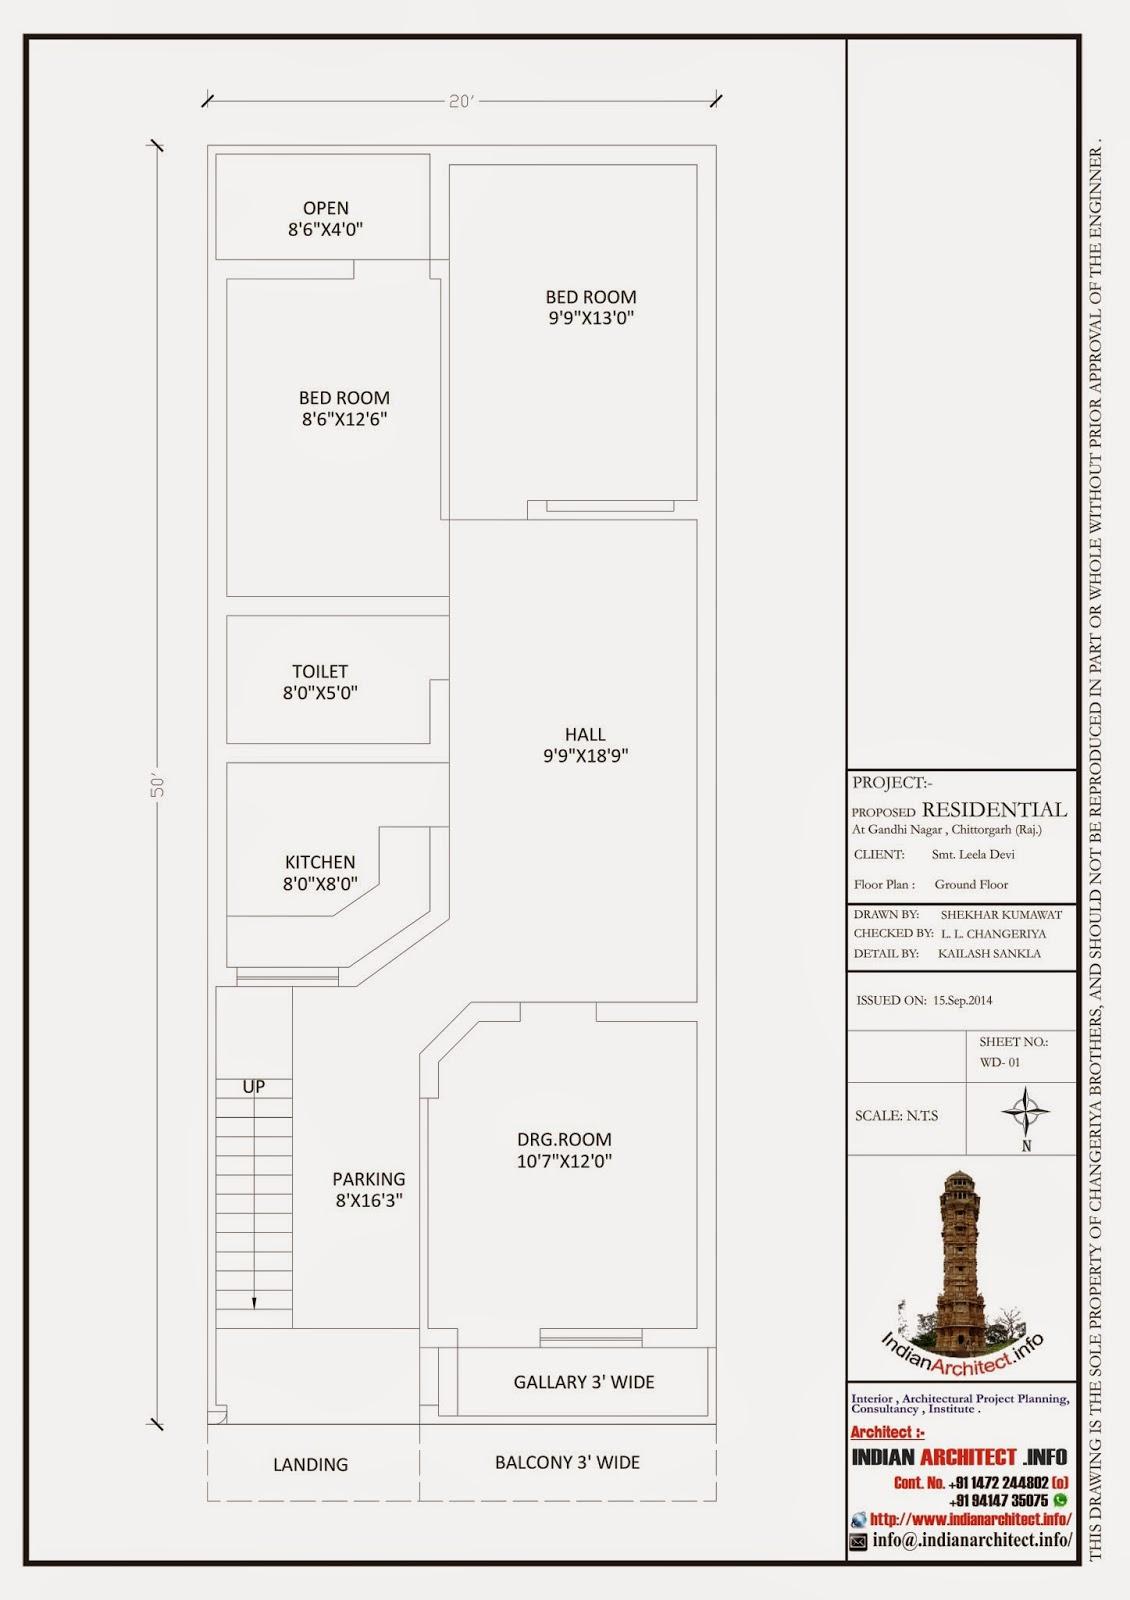 Design house 20x50 - Iii